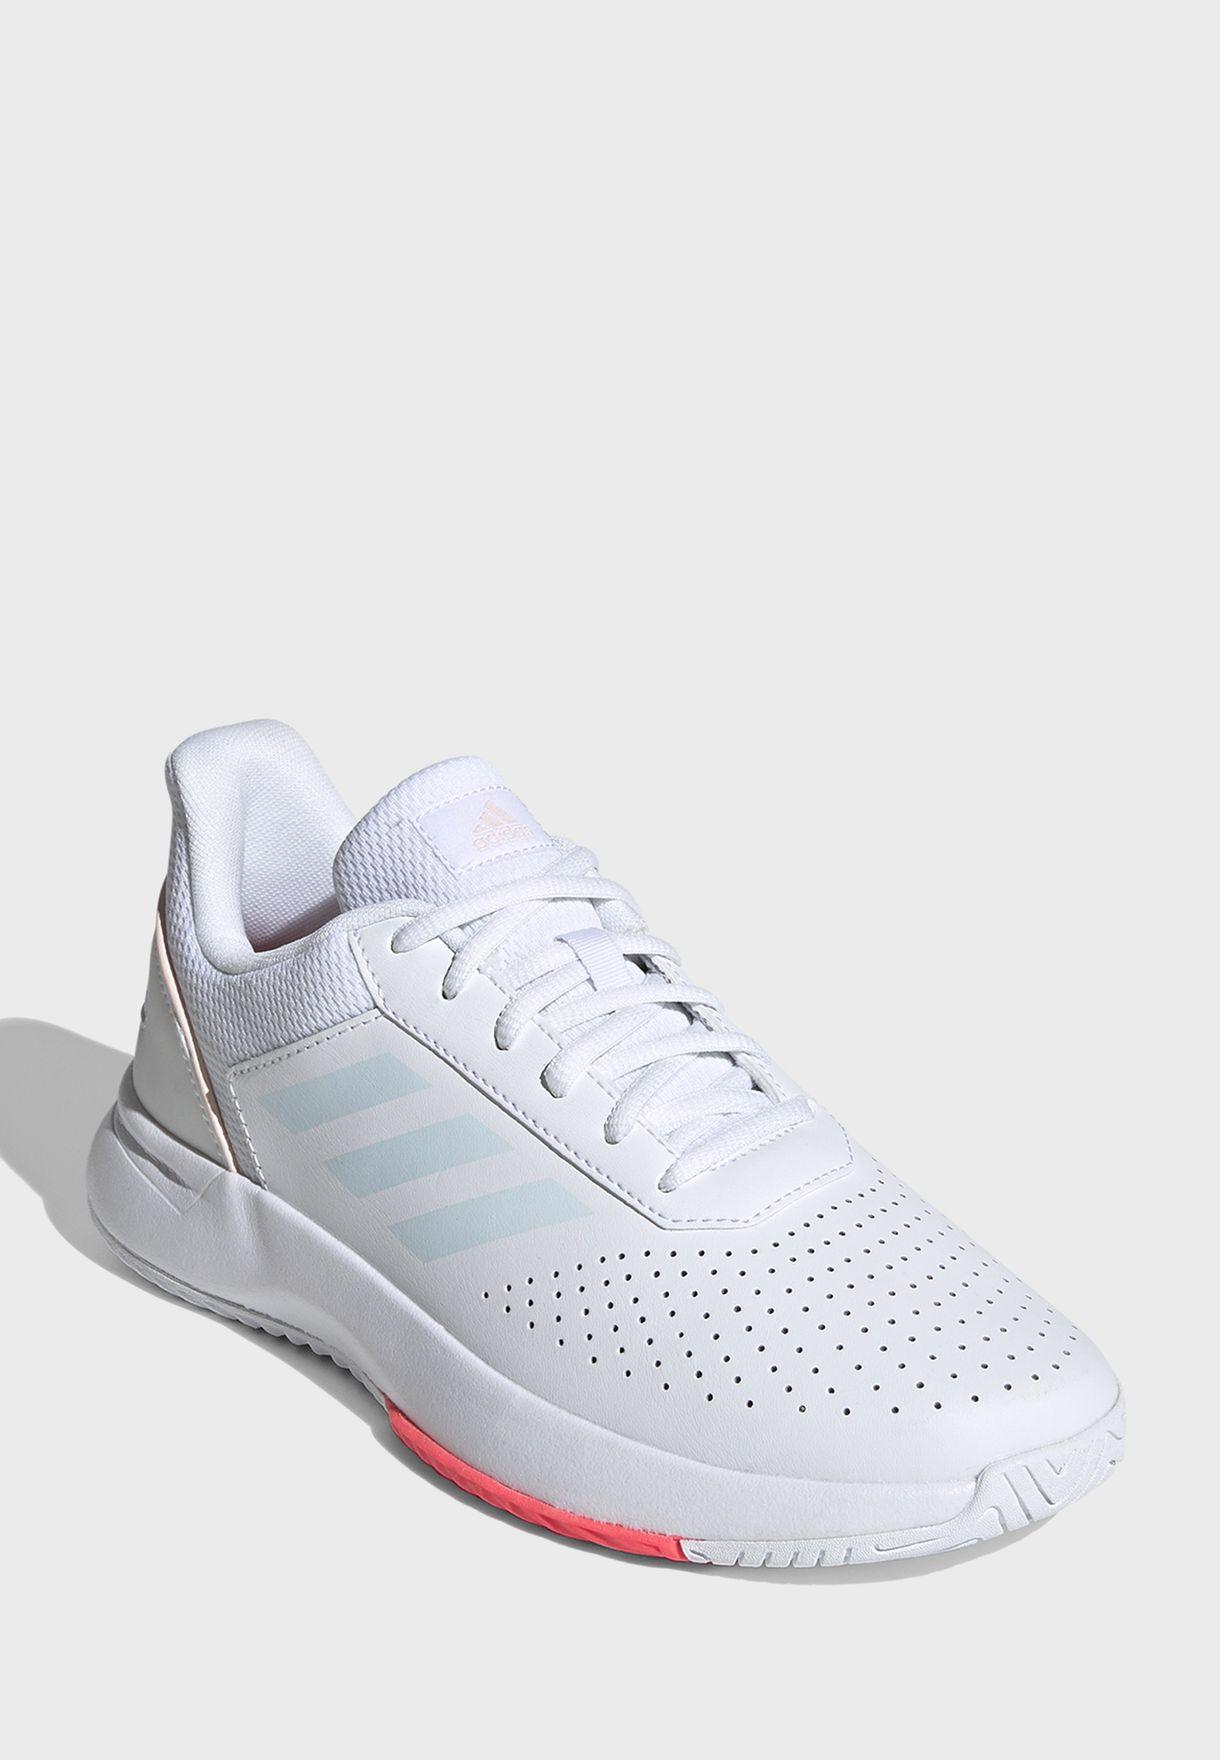 Courtsmash Classic Sports Tennis Women's Shoes